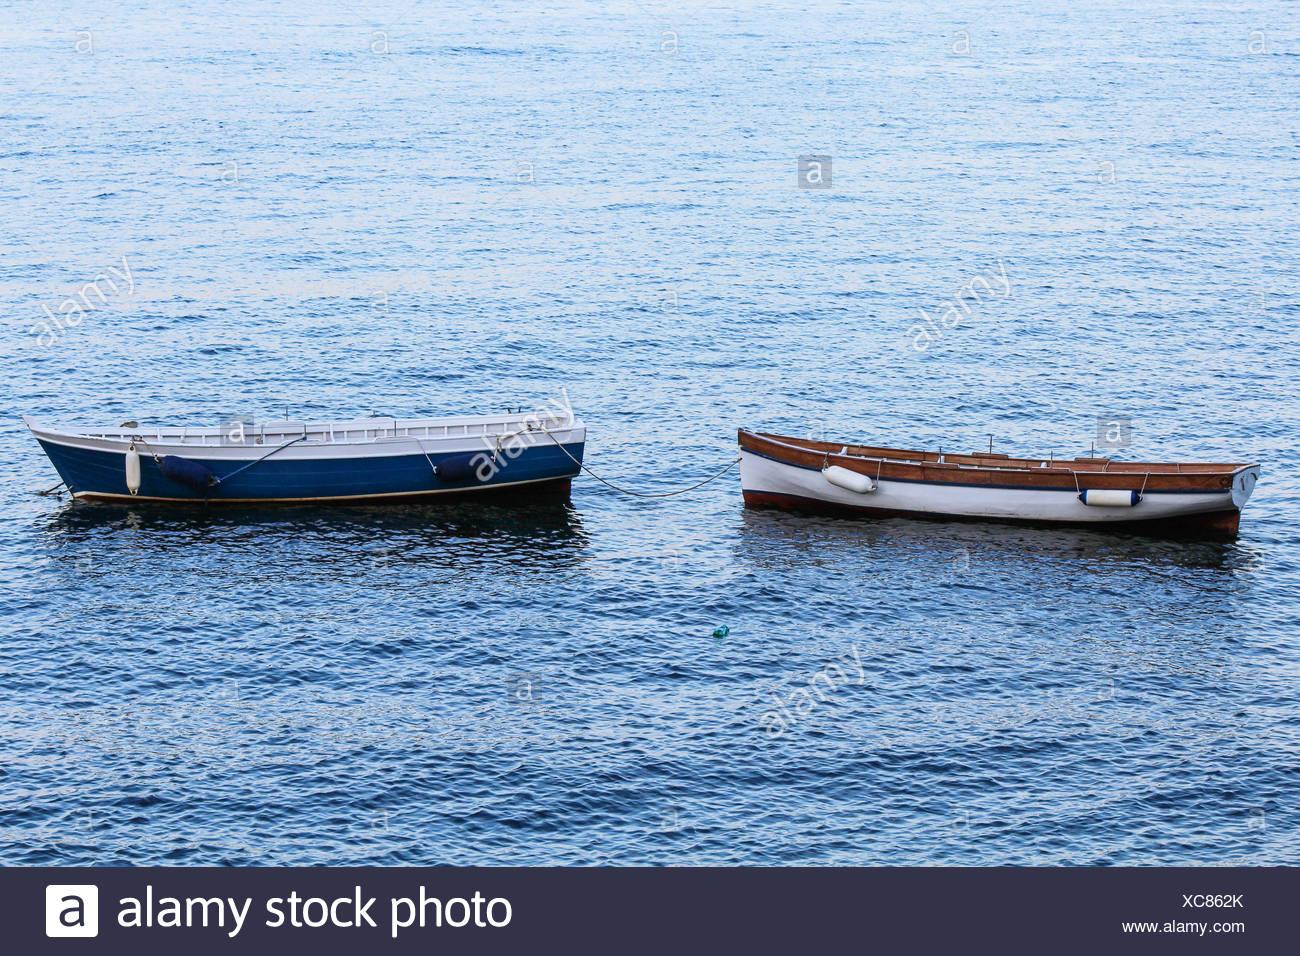 Boote auf dem Meer Stockbild